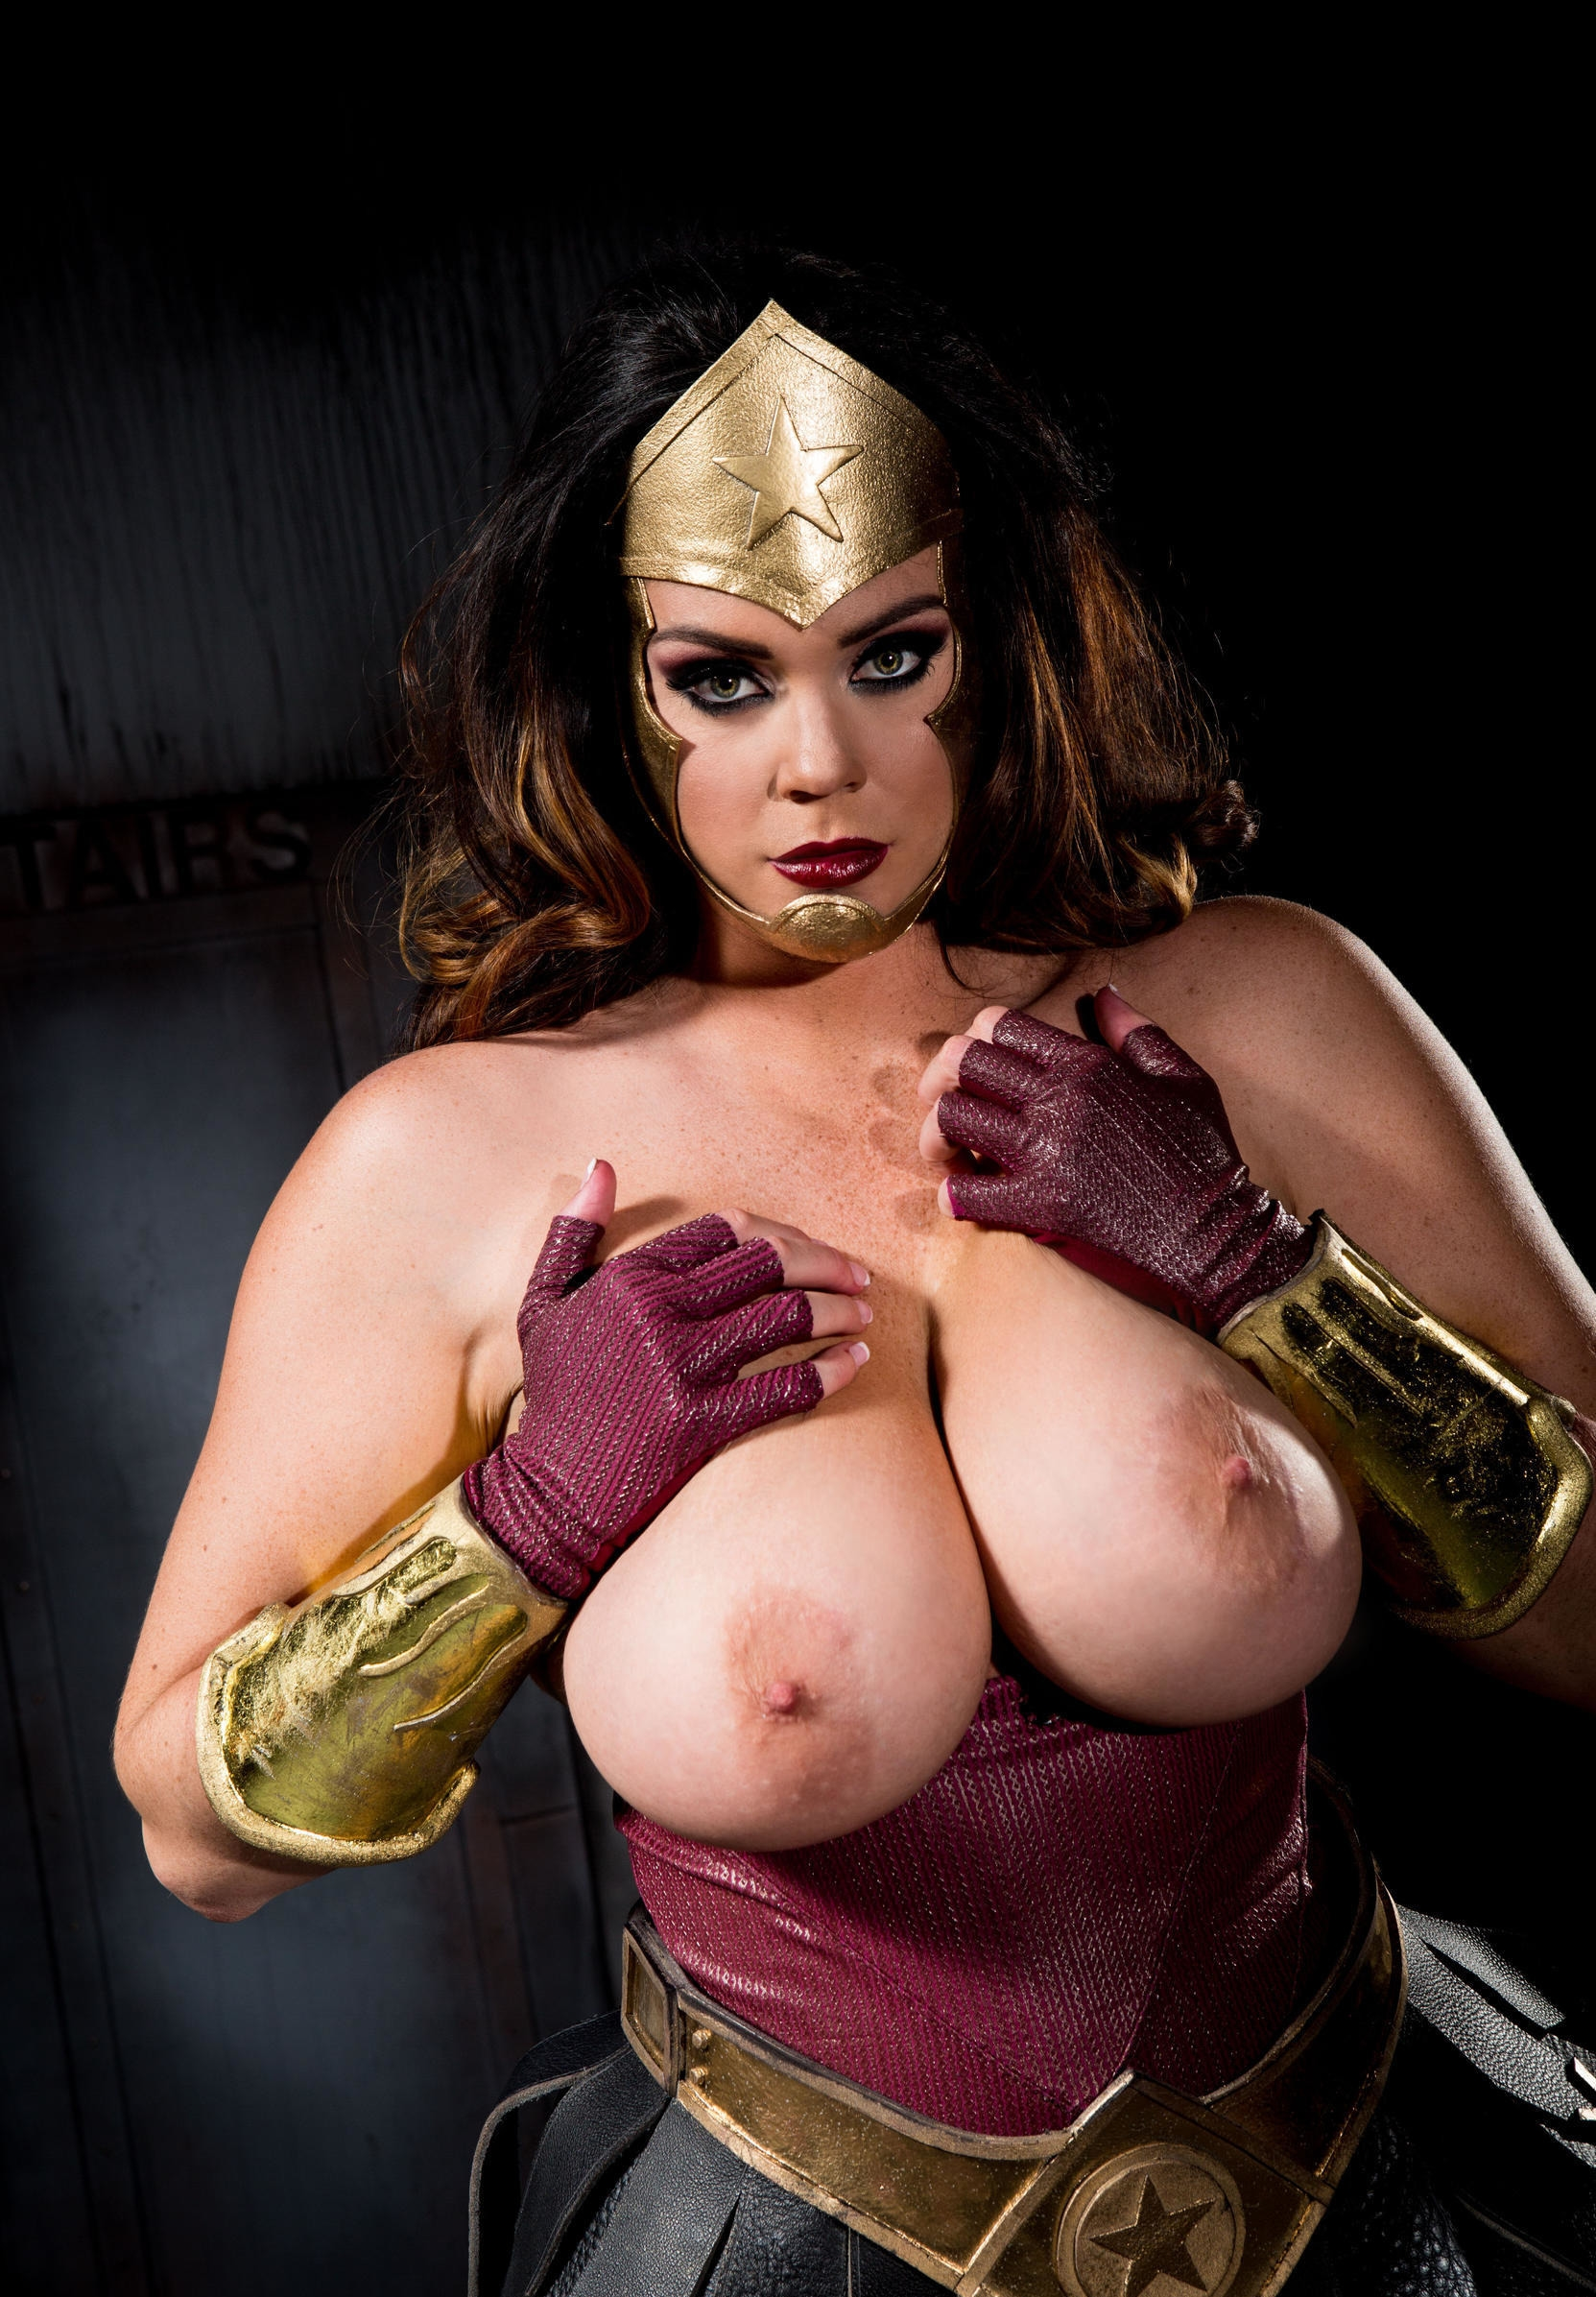 girl-naked-superheroes-females